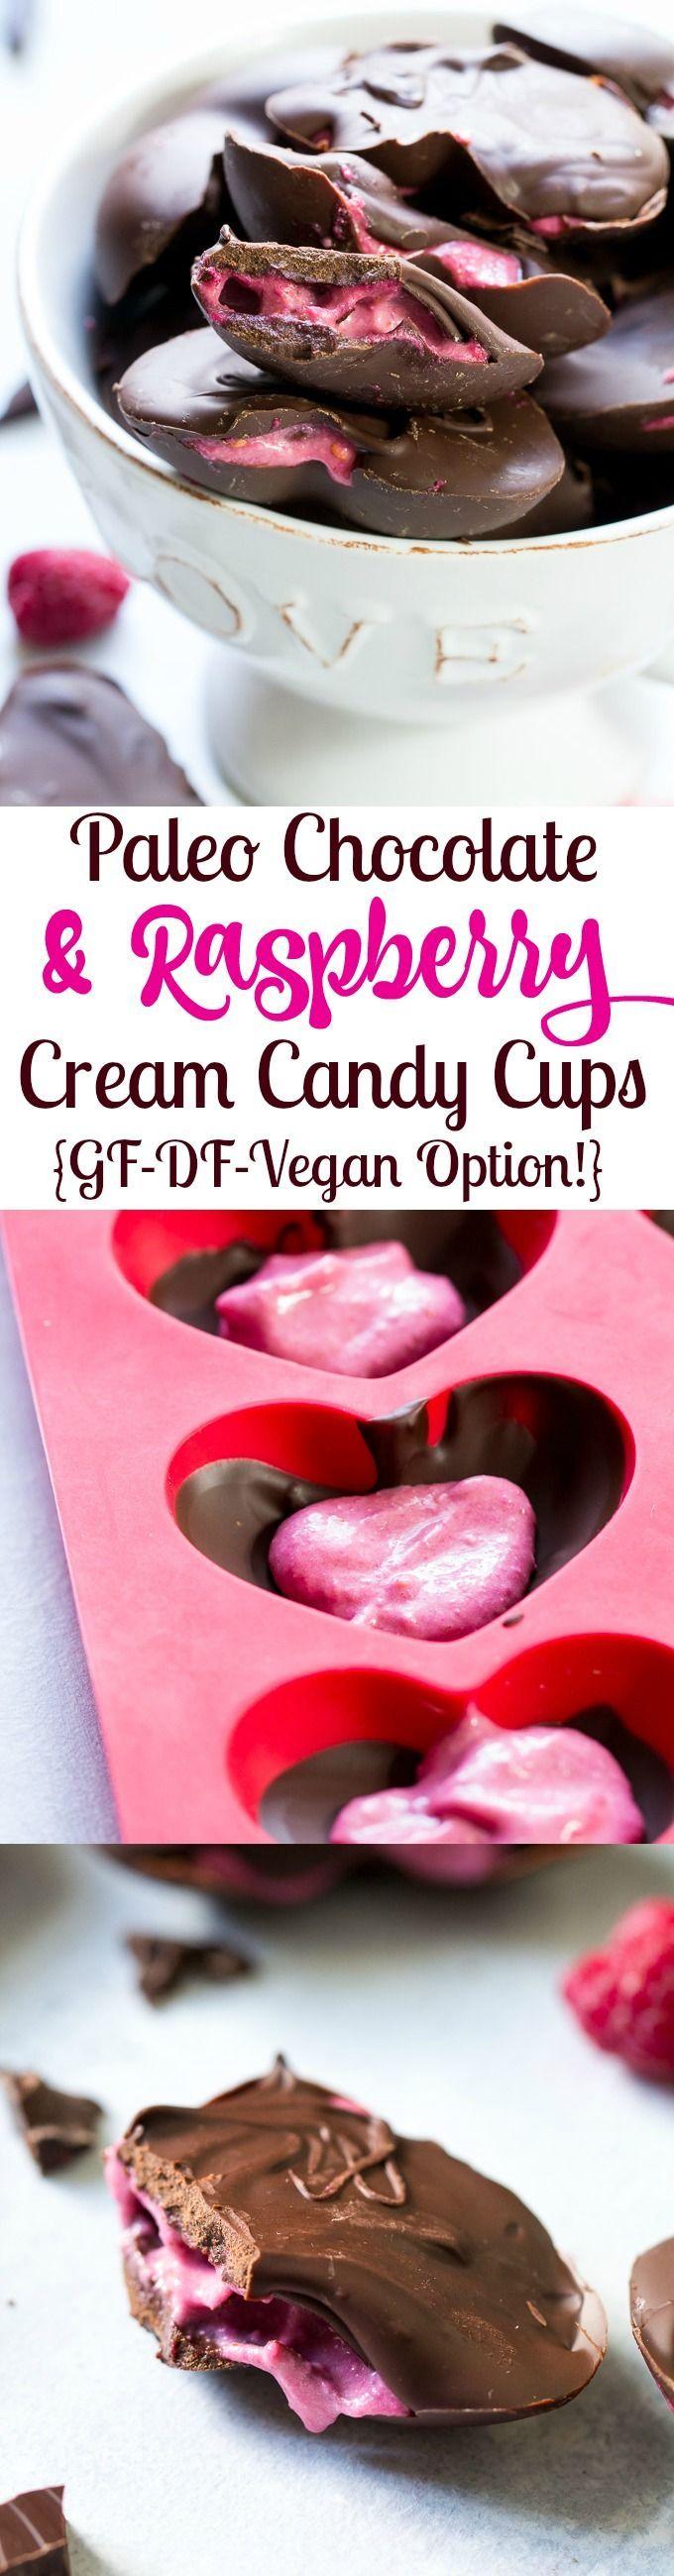 Chocolate Raspberry Cream Paleo Candy Cups {Vegan Option} | The Paleo Running Momma